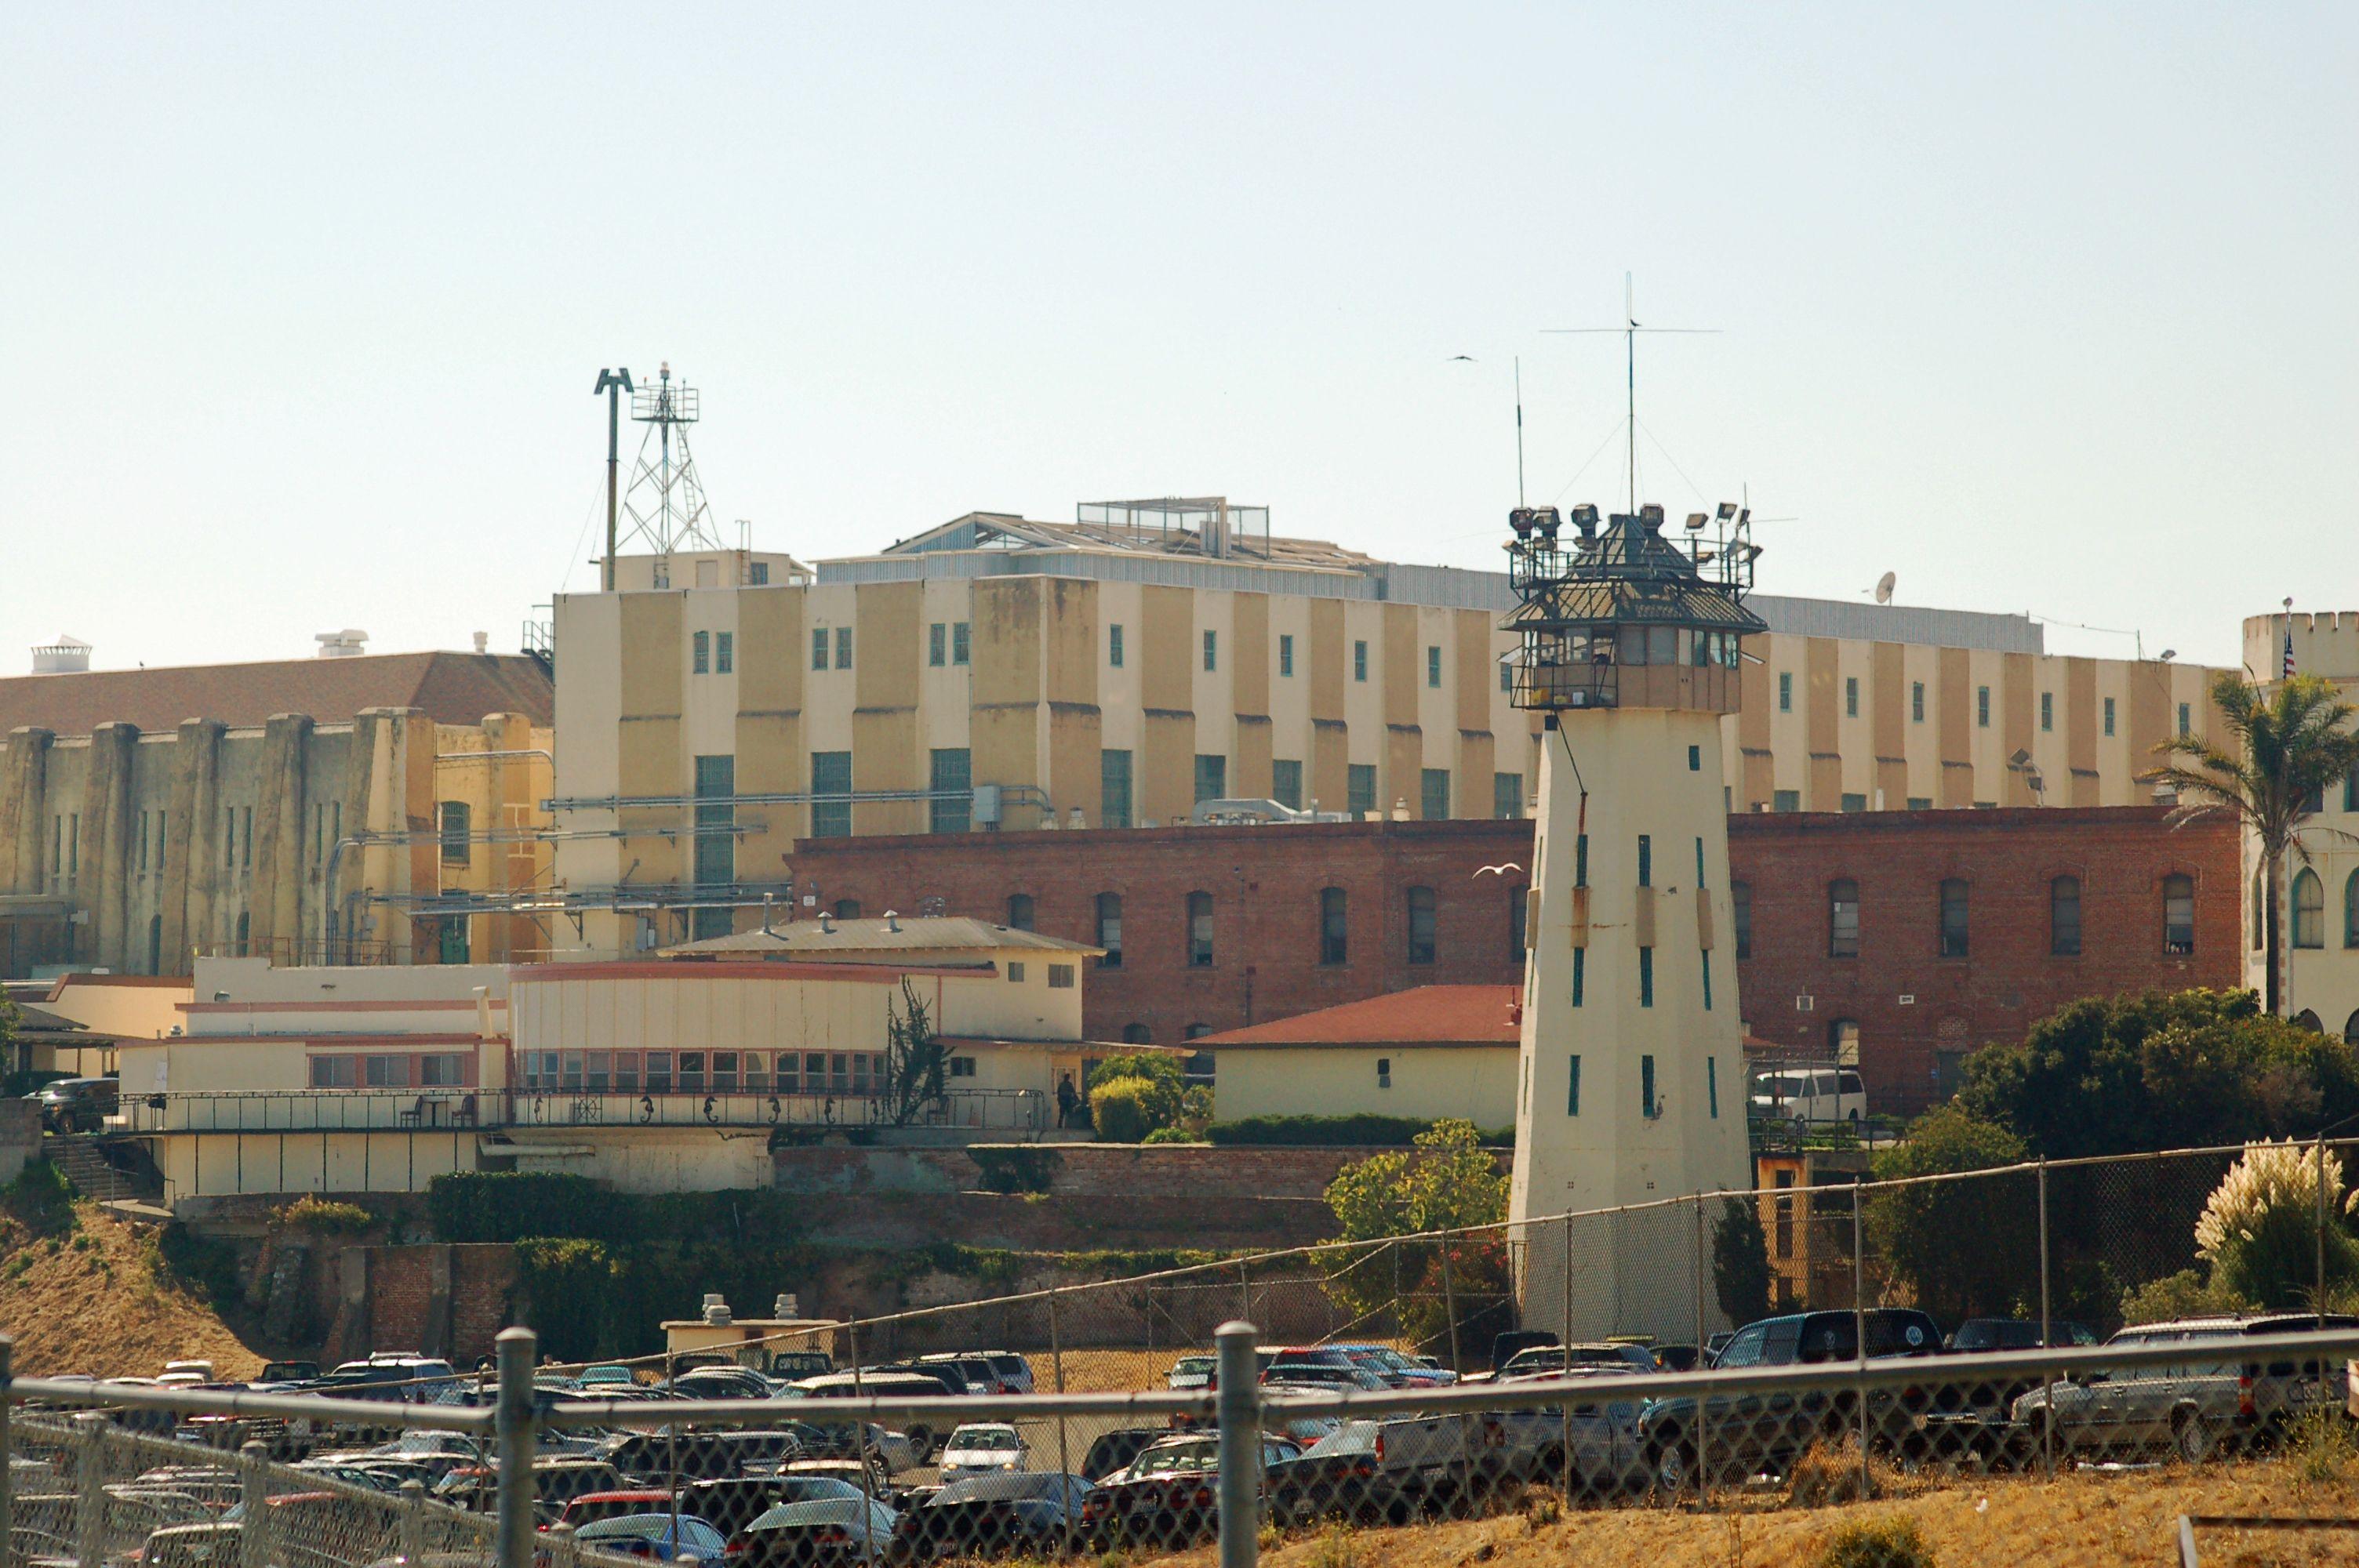 8. San Quentin Prison